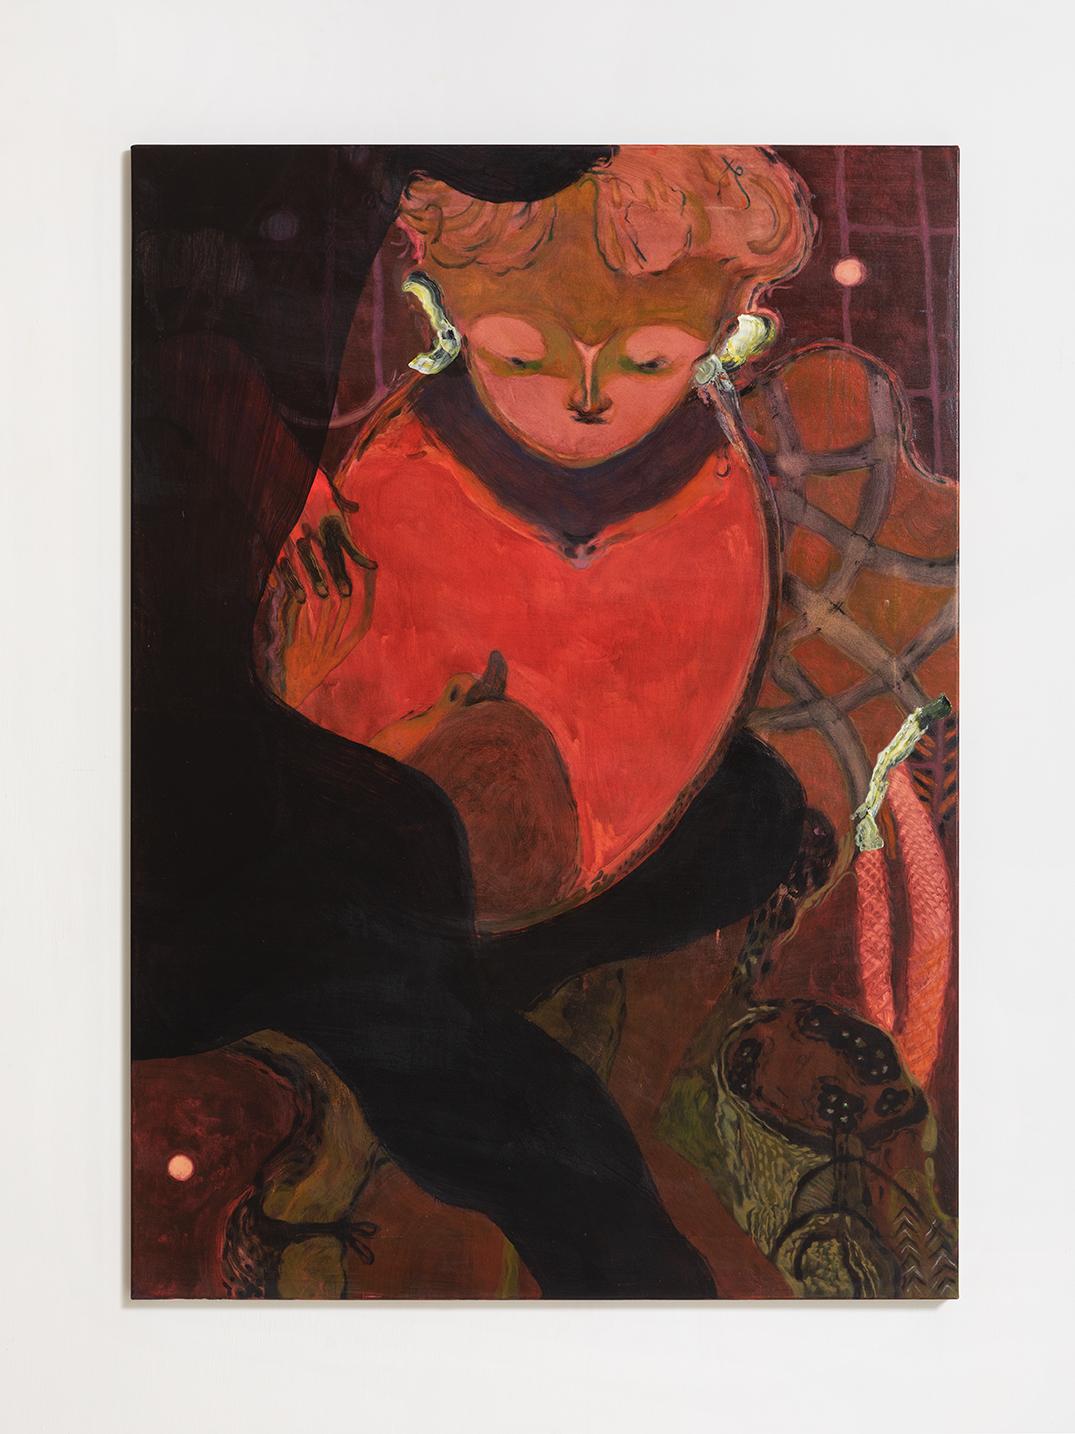 Guglielmo Castelli, Saliva, 2019, tecnica mista su tela, 140x100 cm